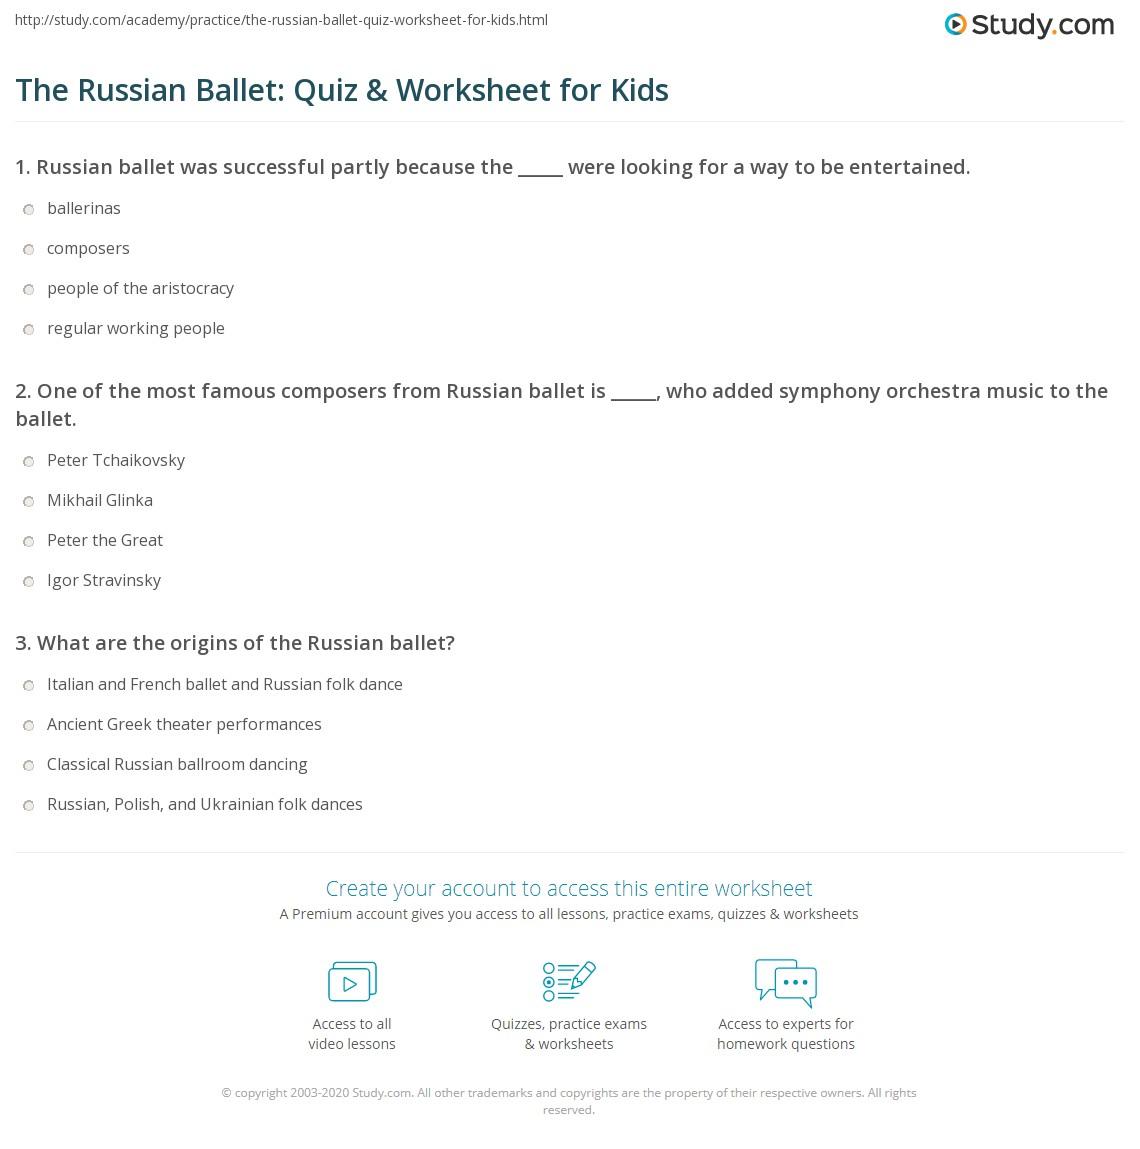 The Russian Ballet Quiz Amp Worksheet For Kids